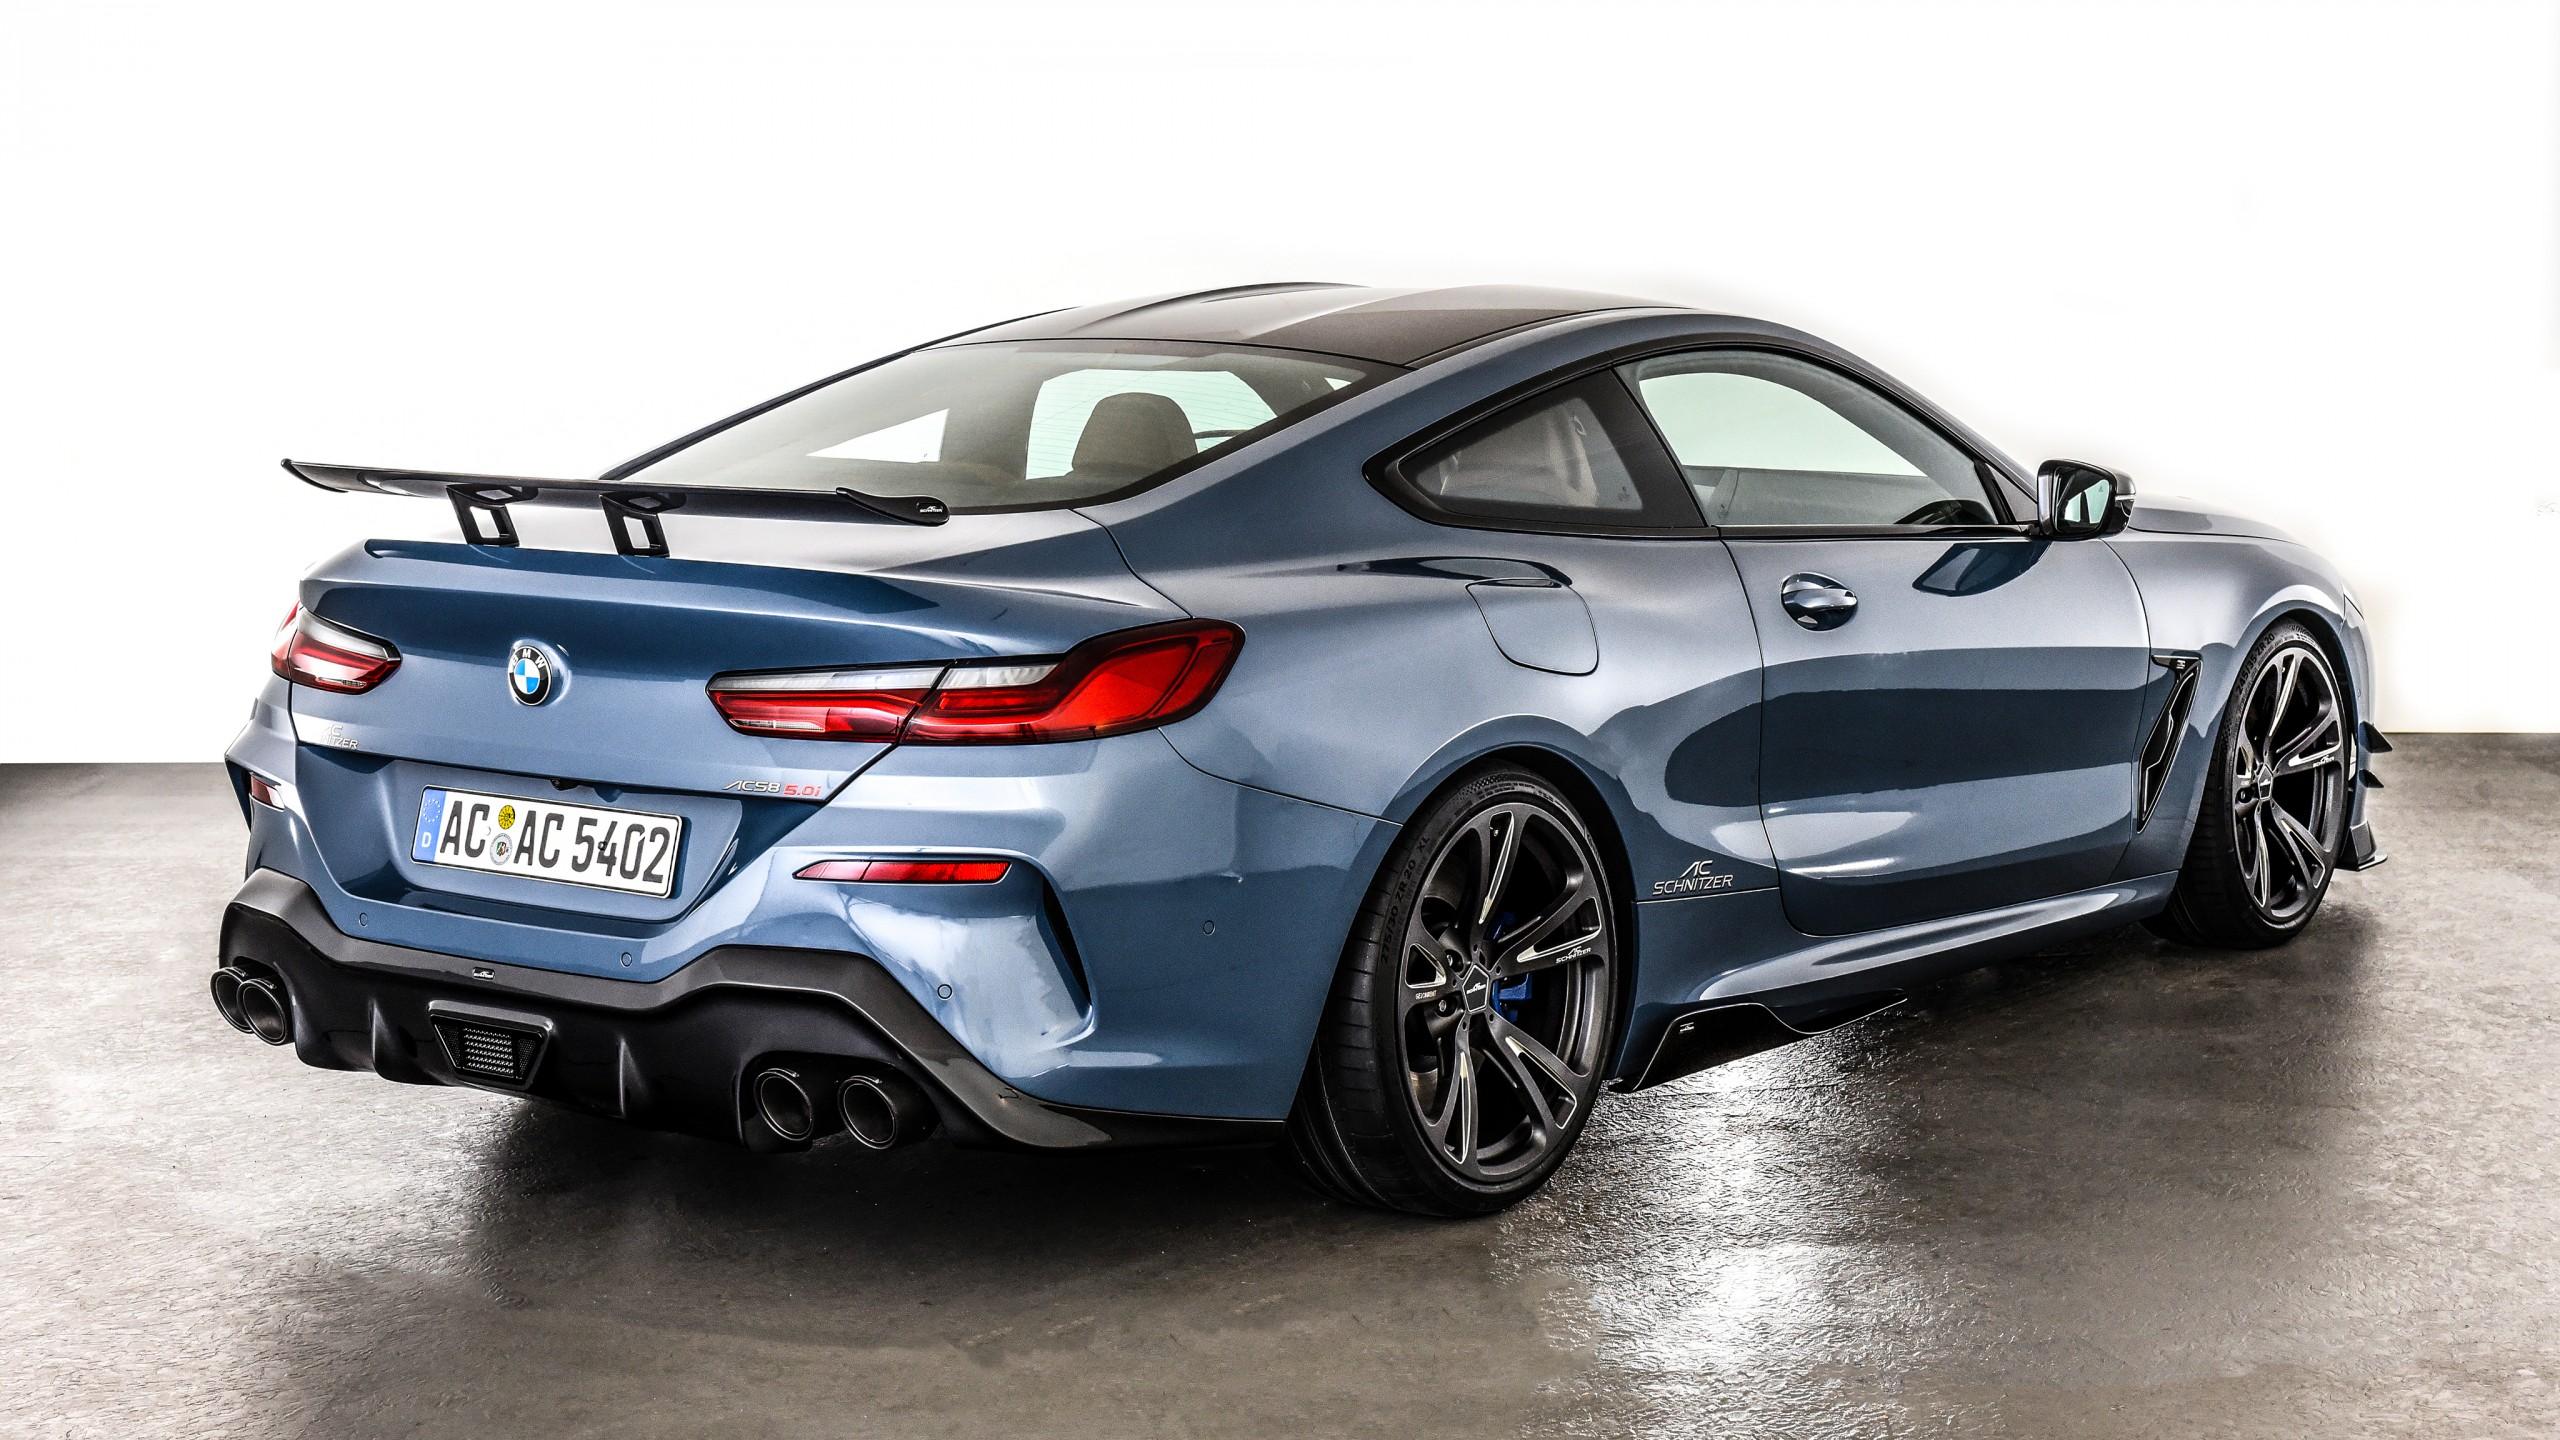 Jaguar F Type Coupe >> Wallpaper AC Schnitzer BMW 8-Series, 2018 Cars, 4K, Cars ...